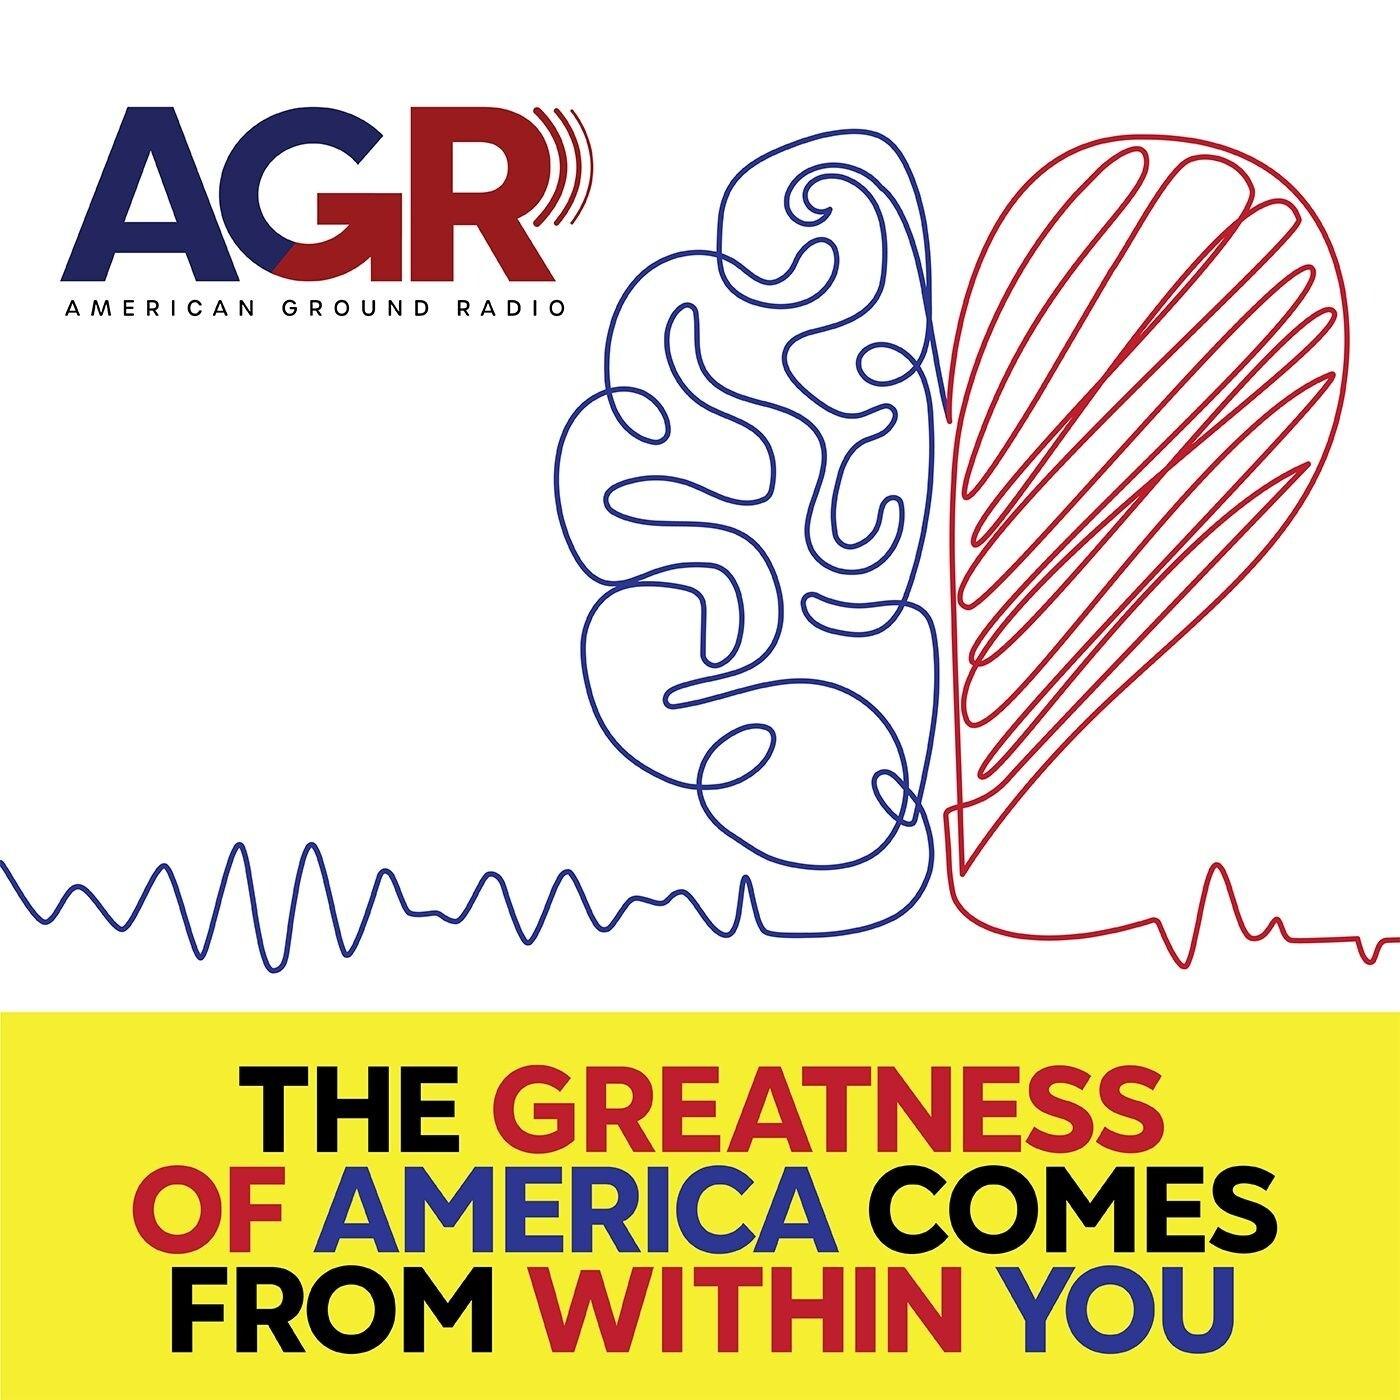 American Ground Radio's Complete Broadcast 10-15-2020